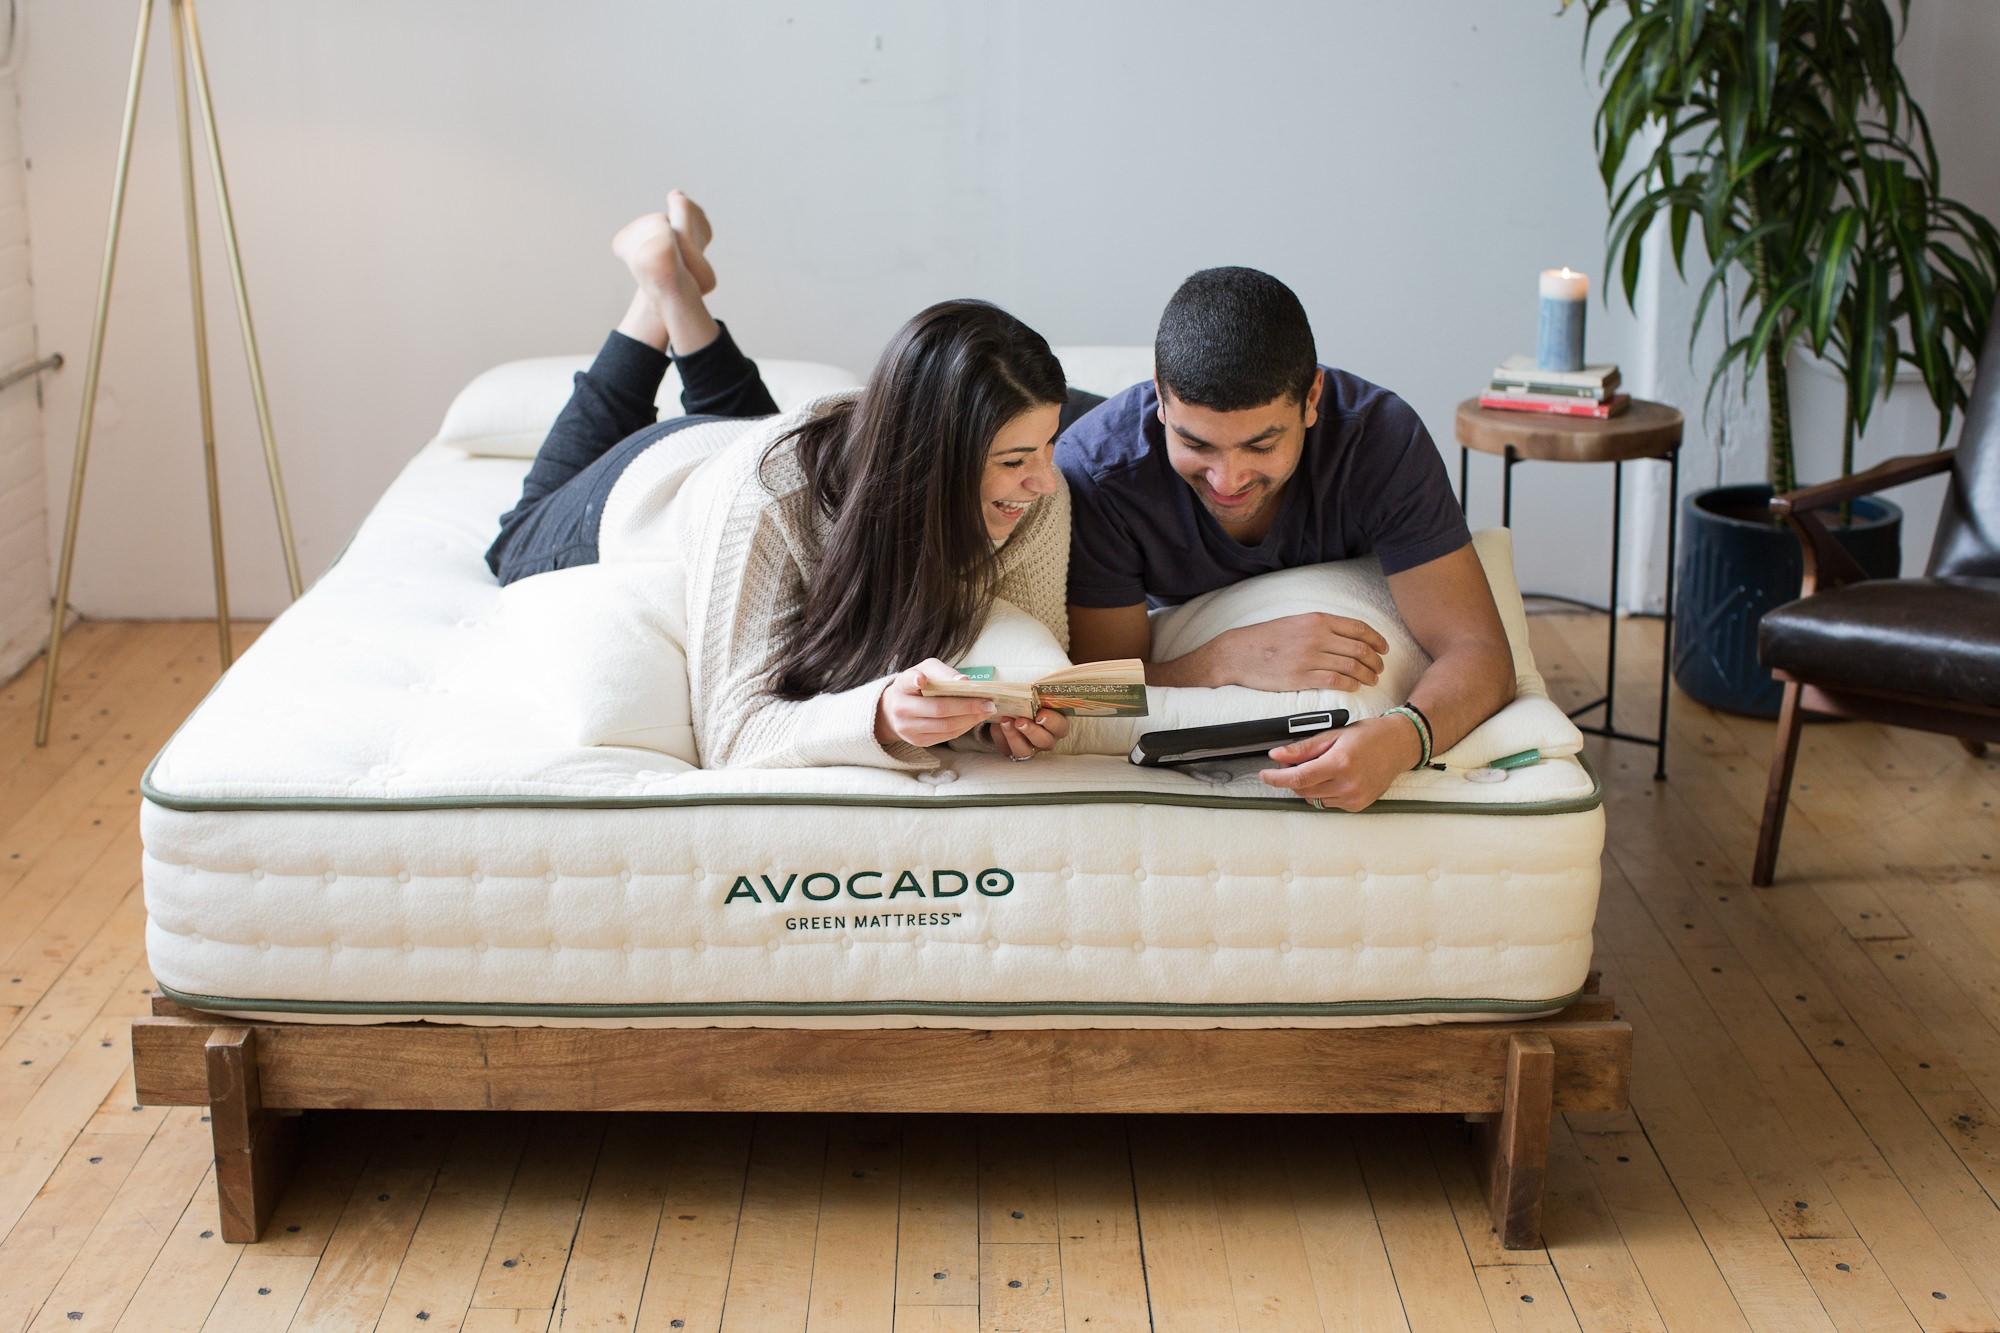 Avocado mattress in bedroom